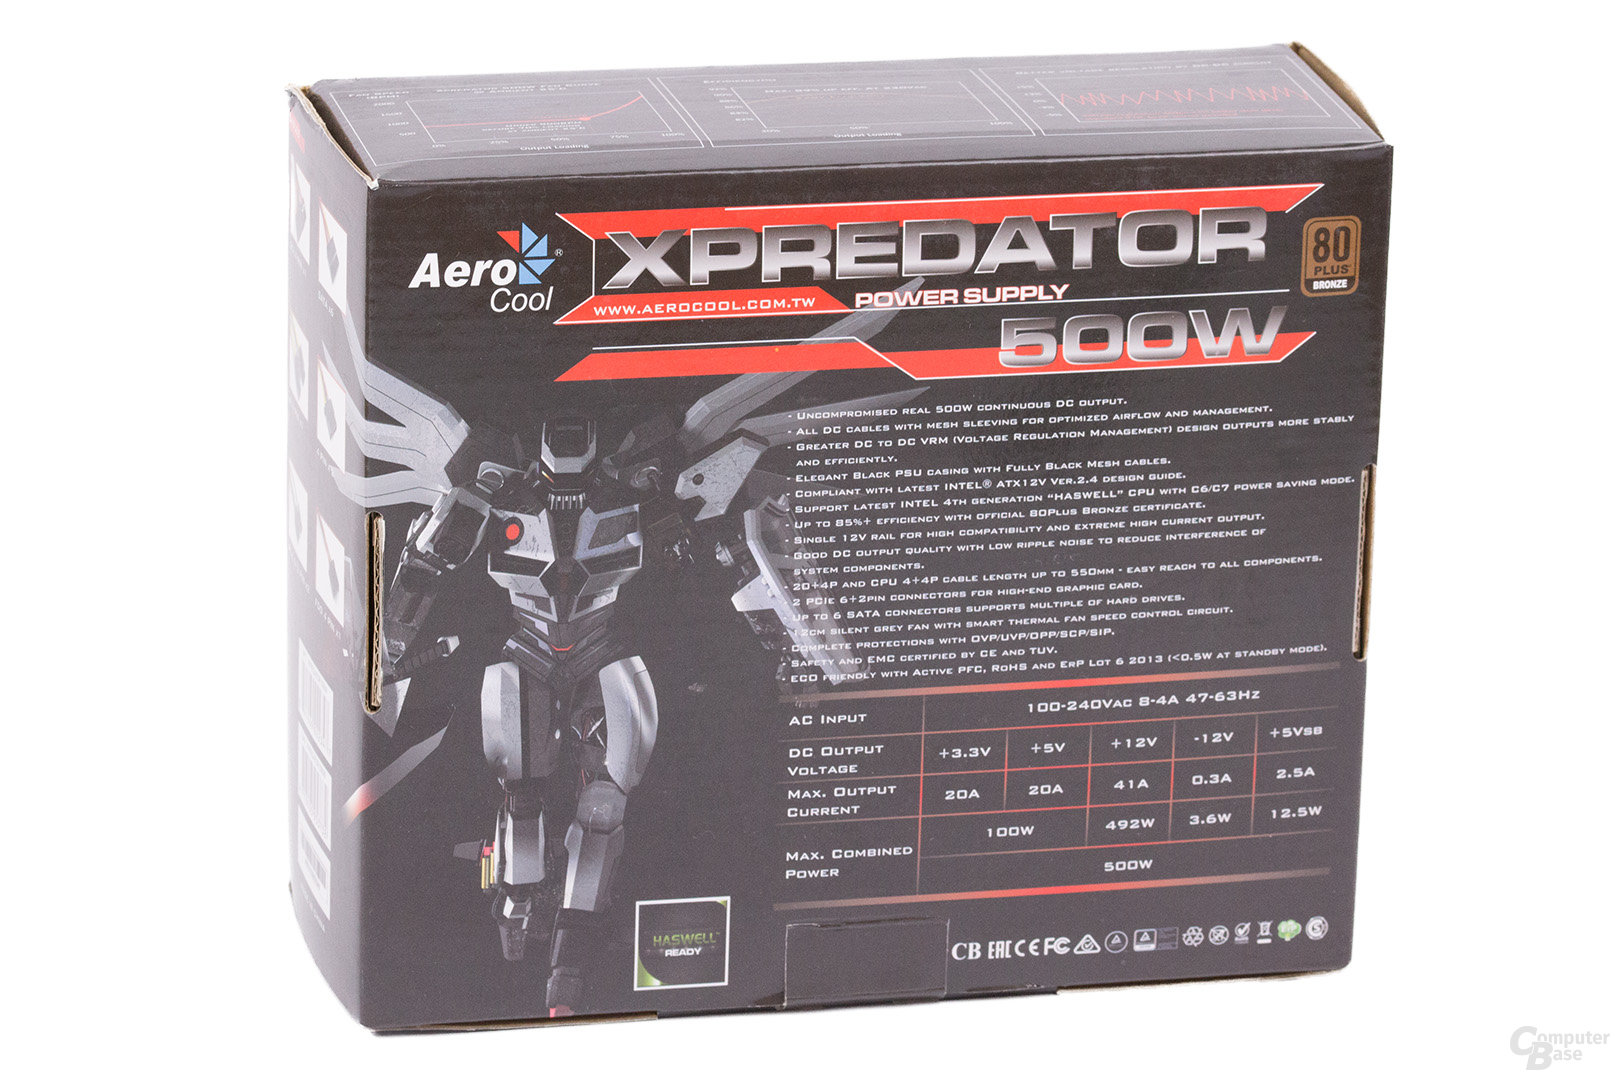 Aerocool Xpredator 500W